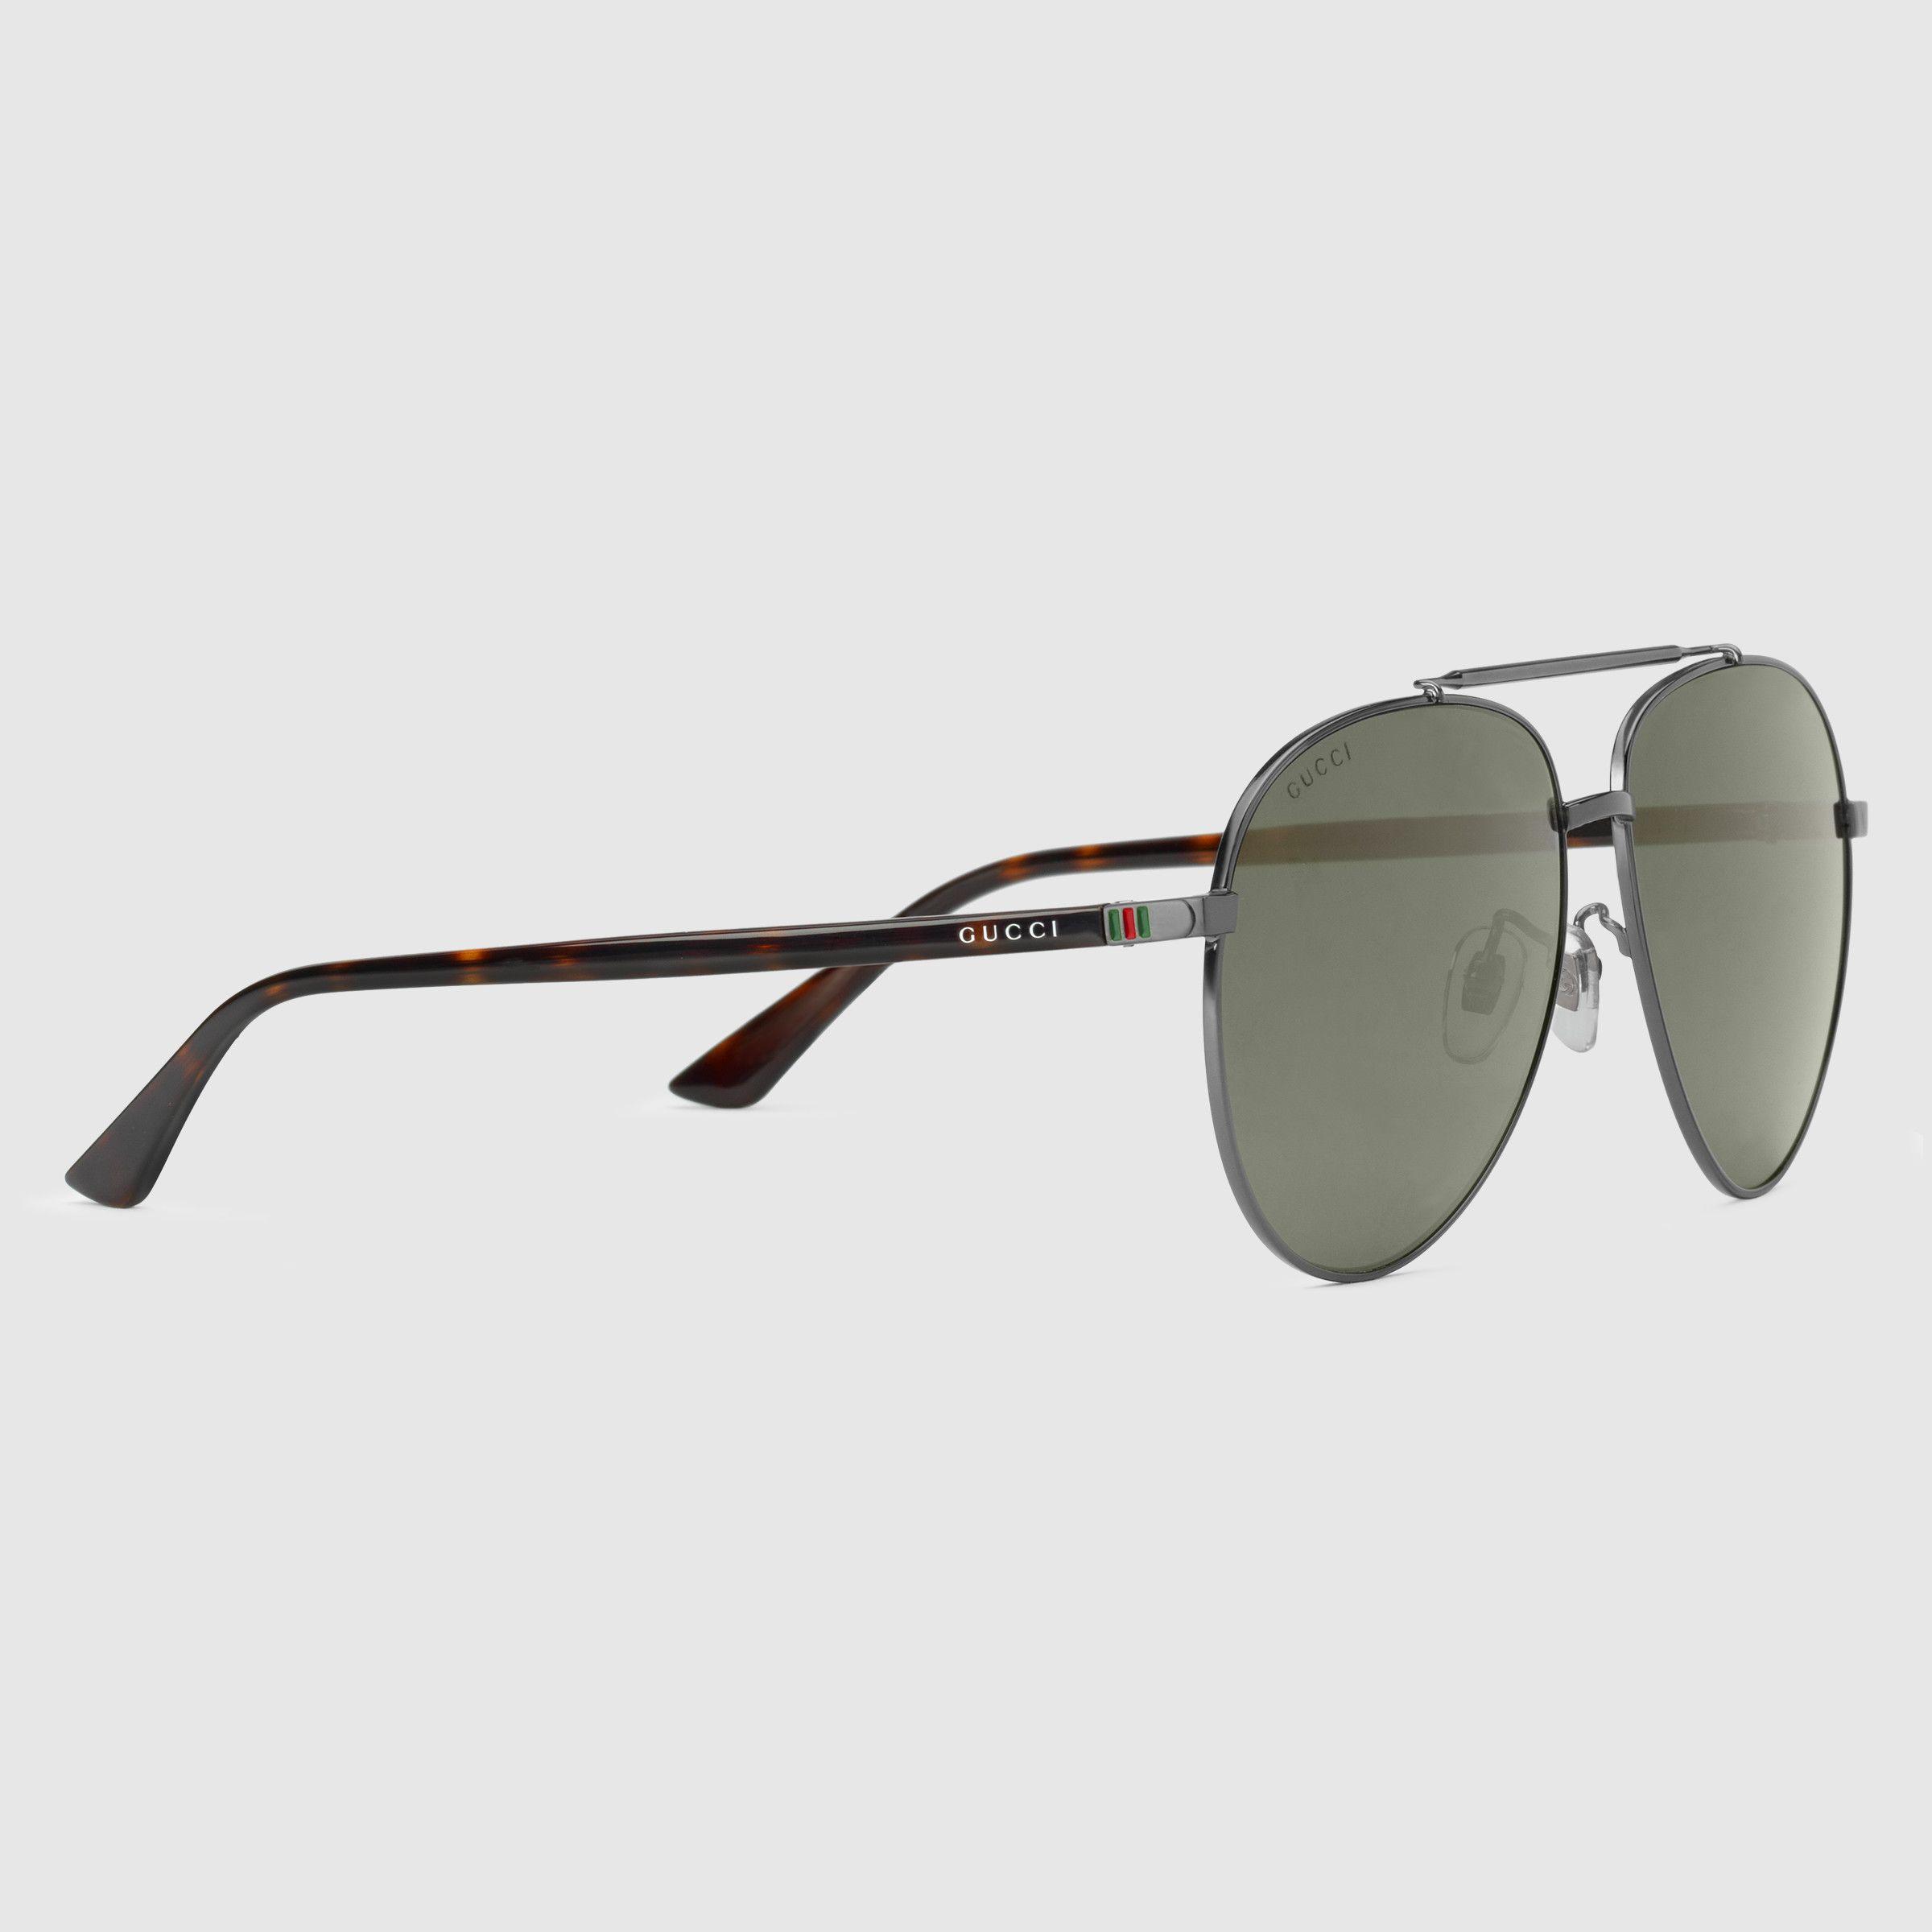 Gucci Aviator sunglasses Detail 2 | Eyewear 1 | Pinterest